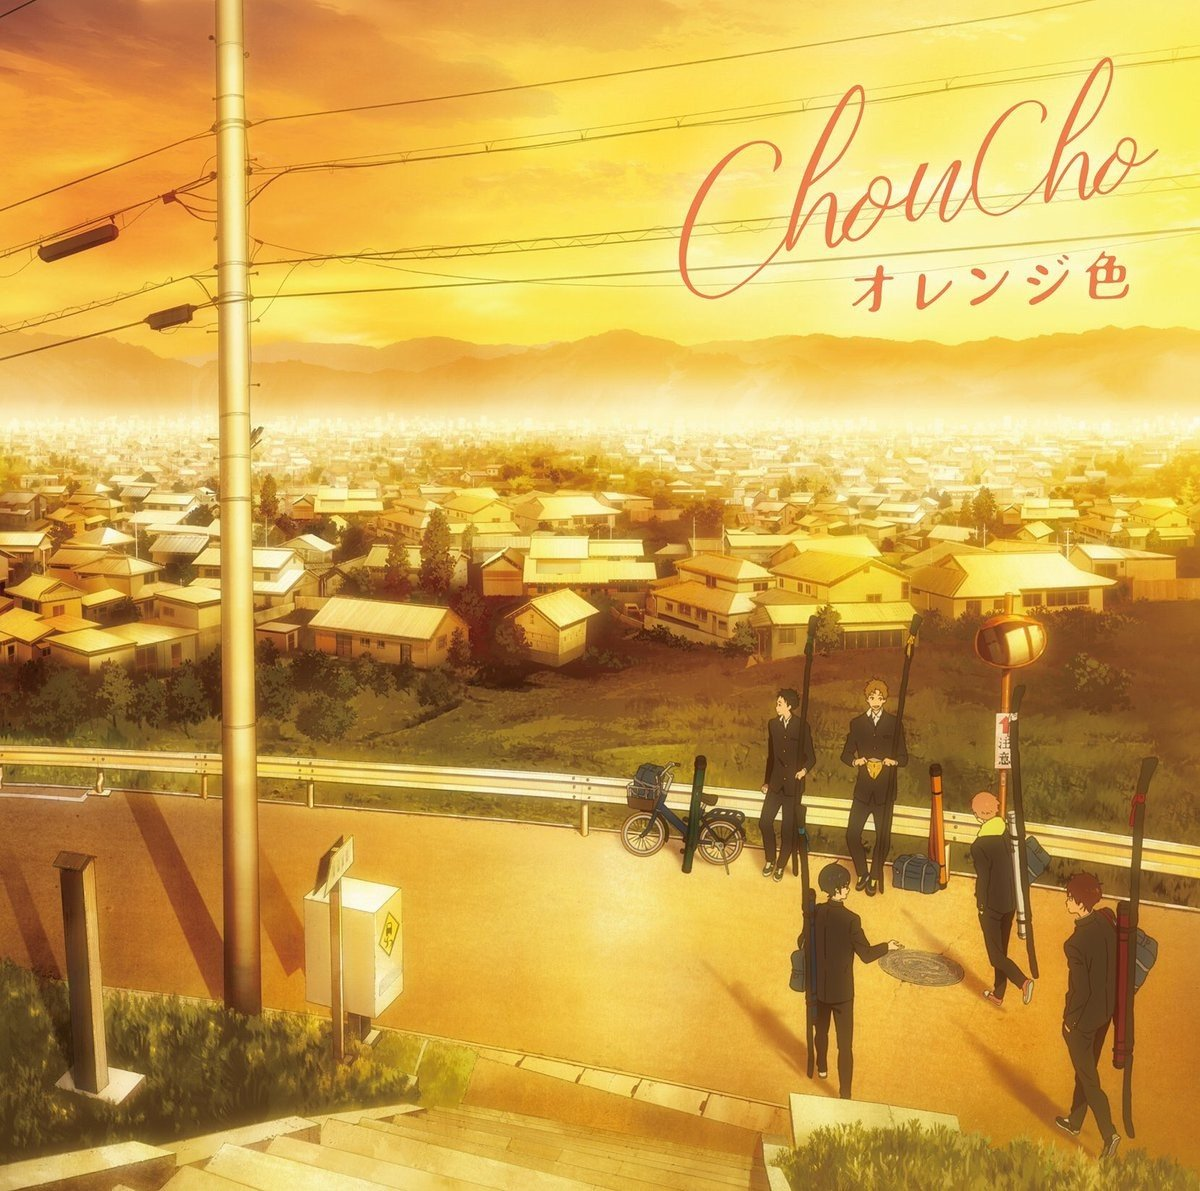 [Single] ChouCho (ちょうちょ) – オレンジ色 [FLAC / 24bit Lossless / WEB] [2018.10.31]